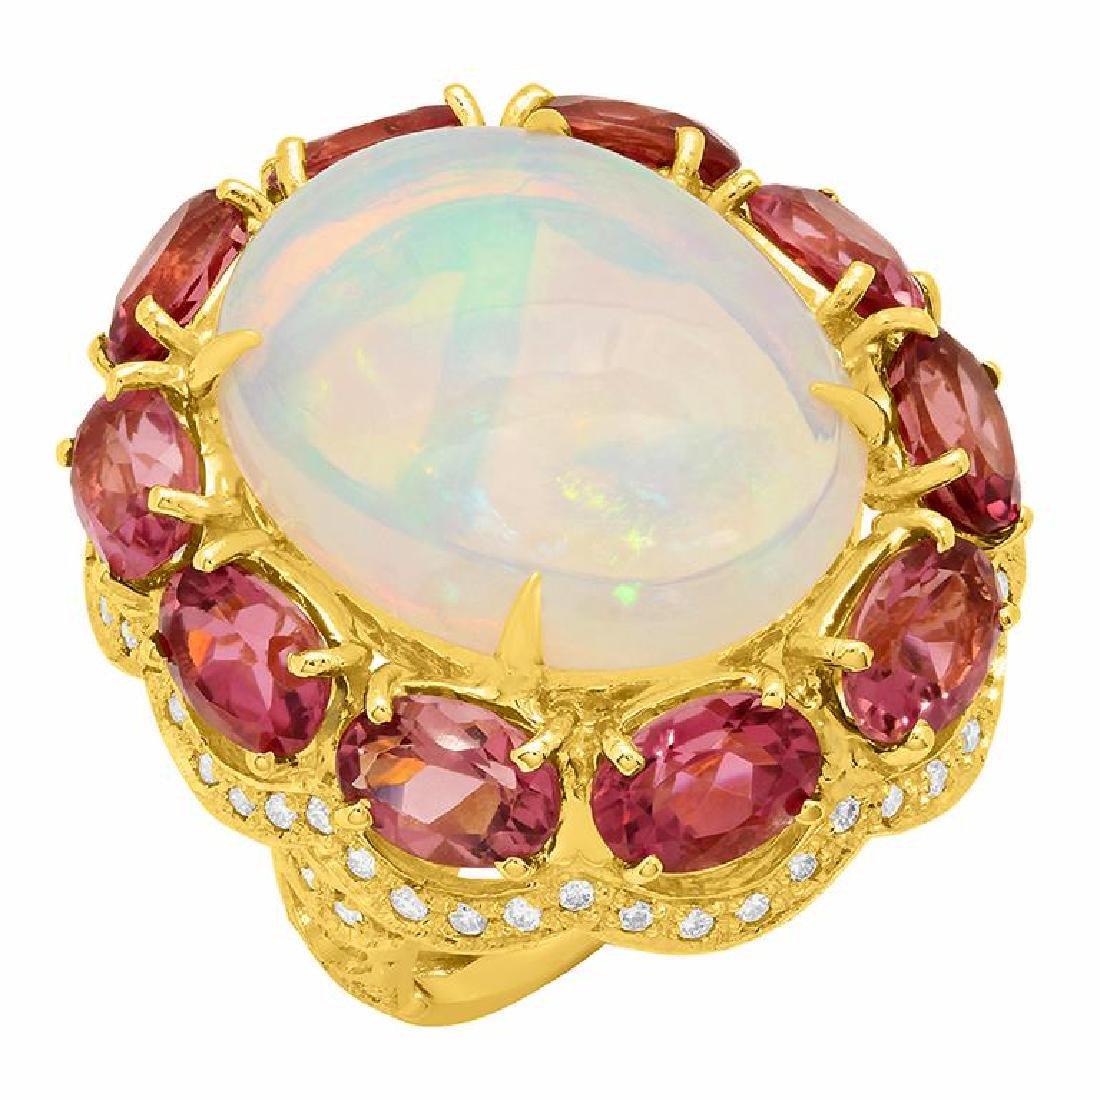 14k Yellow Gold 10.52ct Ethiopian Opal 8.67ct Pink